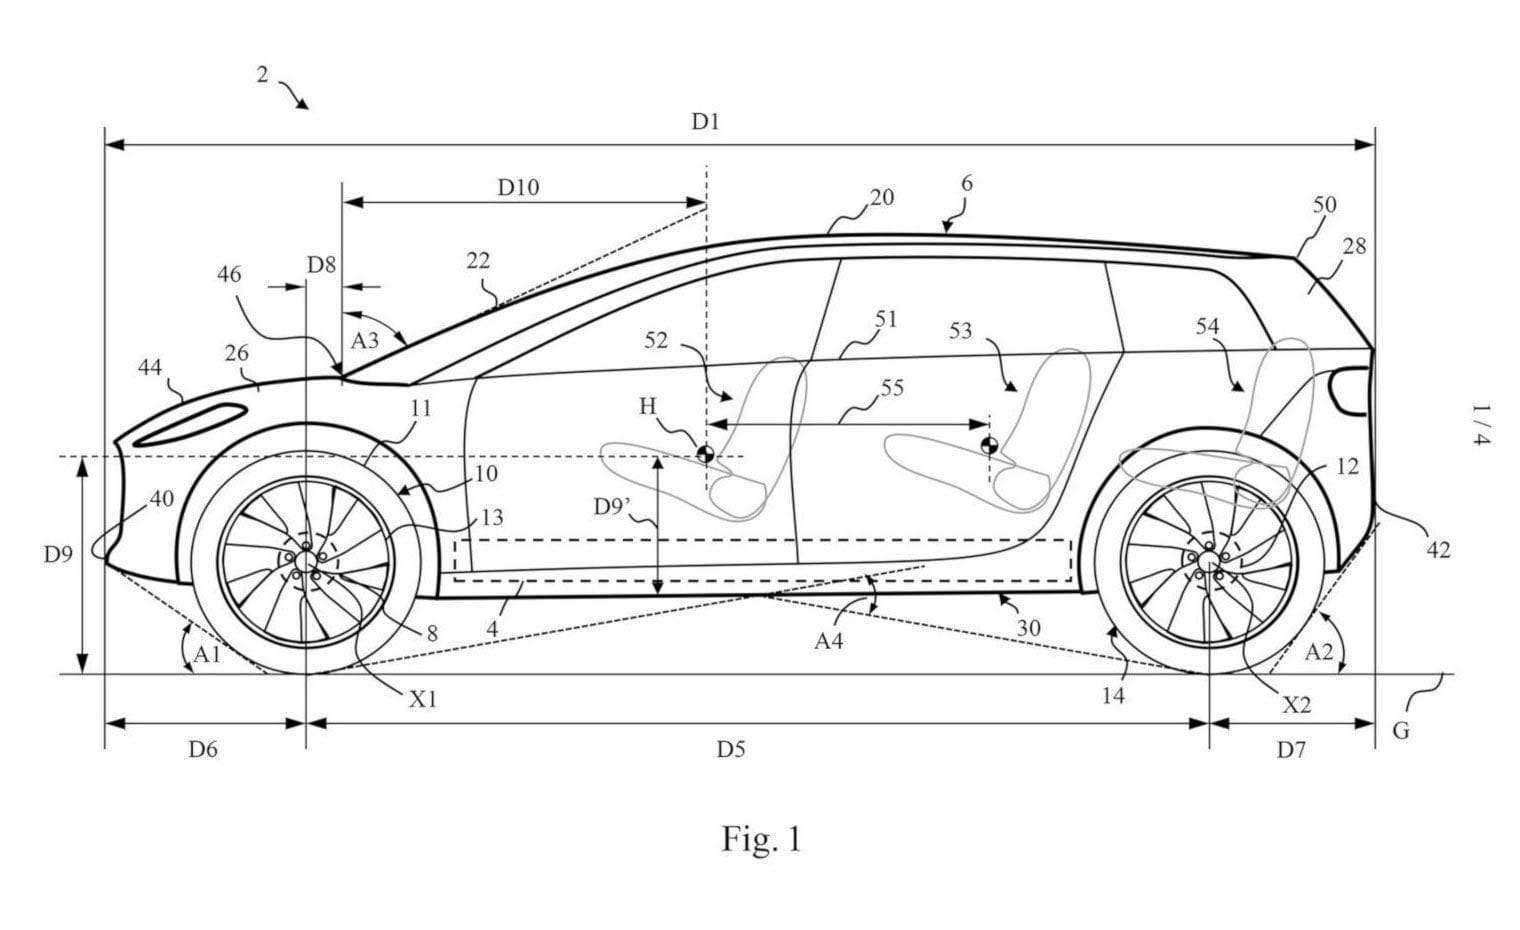 Dyson electric car patent